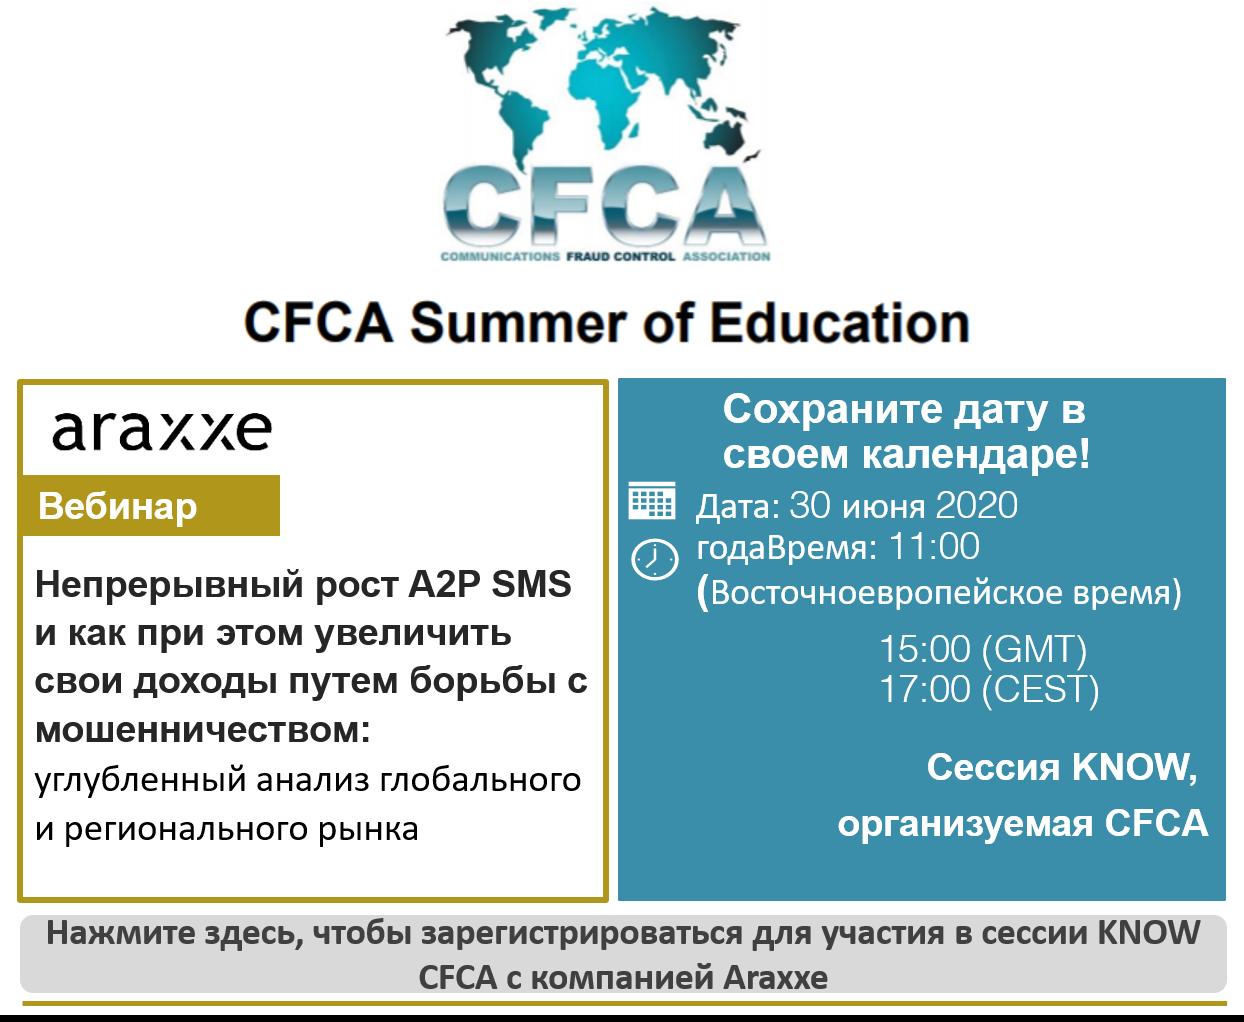 CFCA & Araxxe Webinar A2P SMS Americas